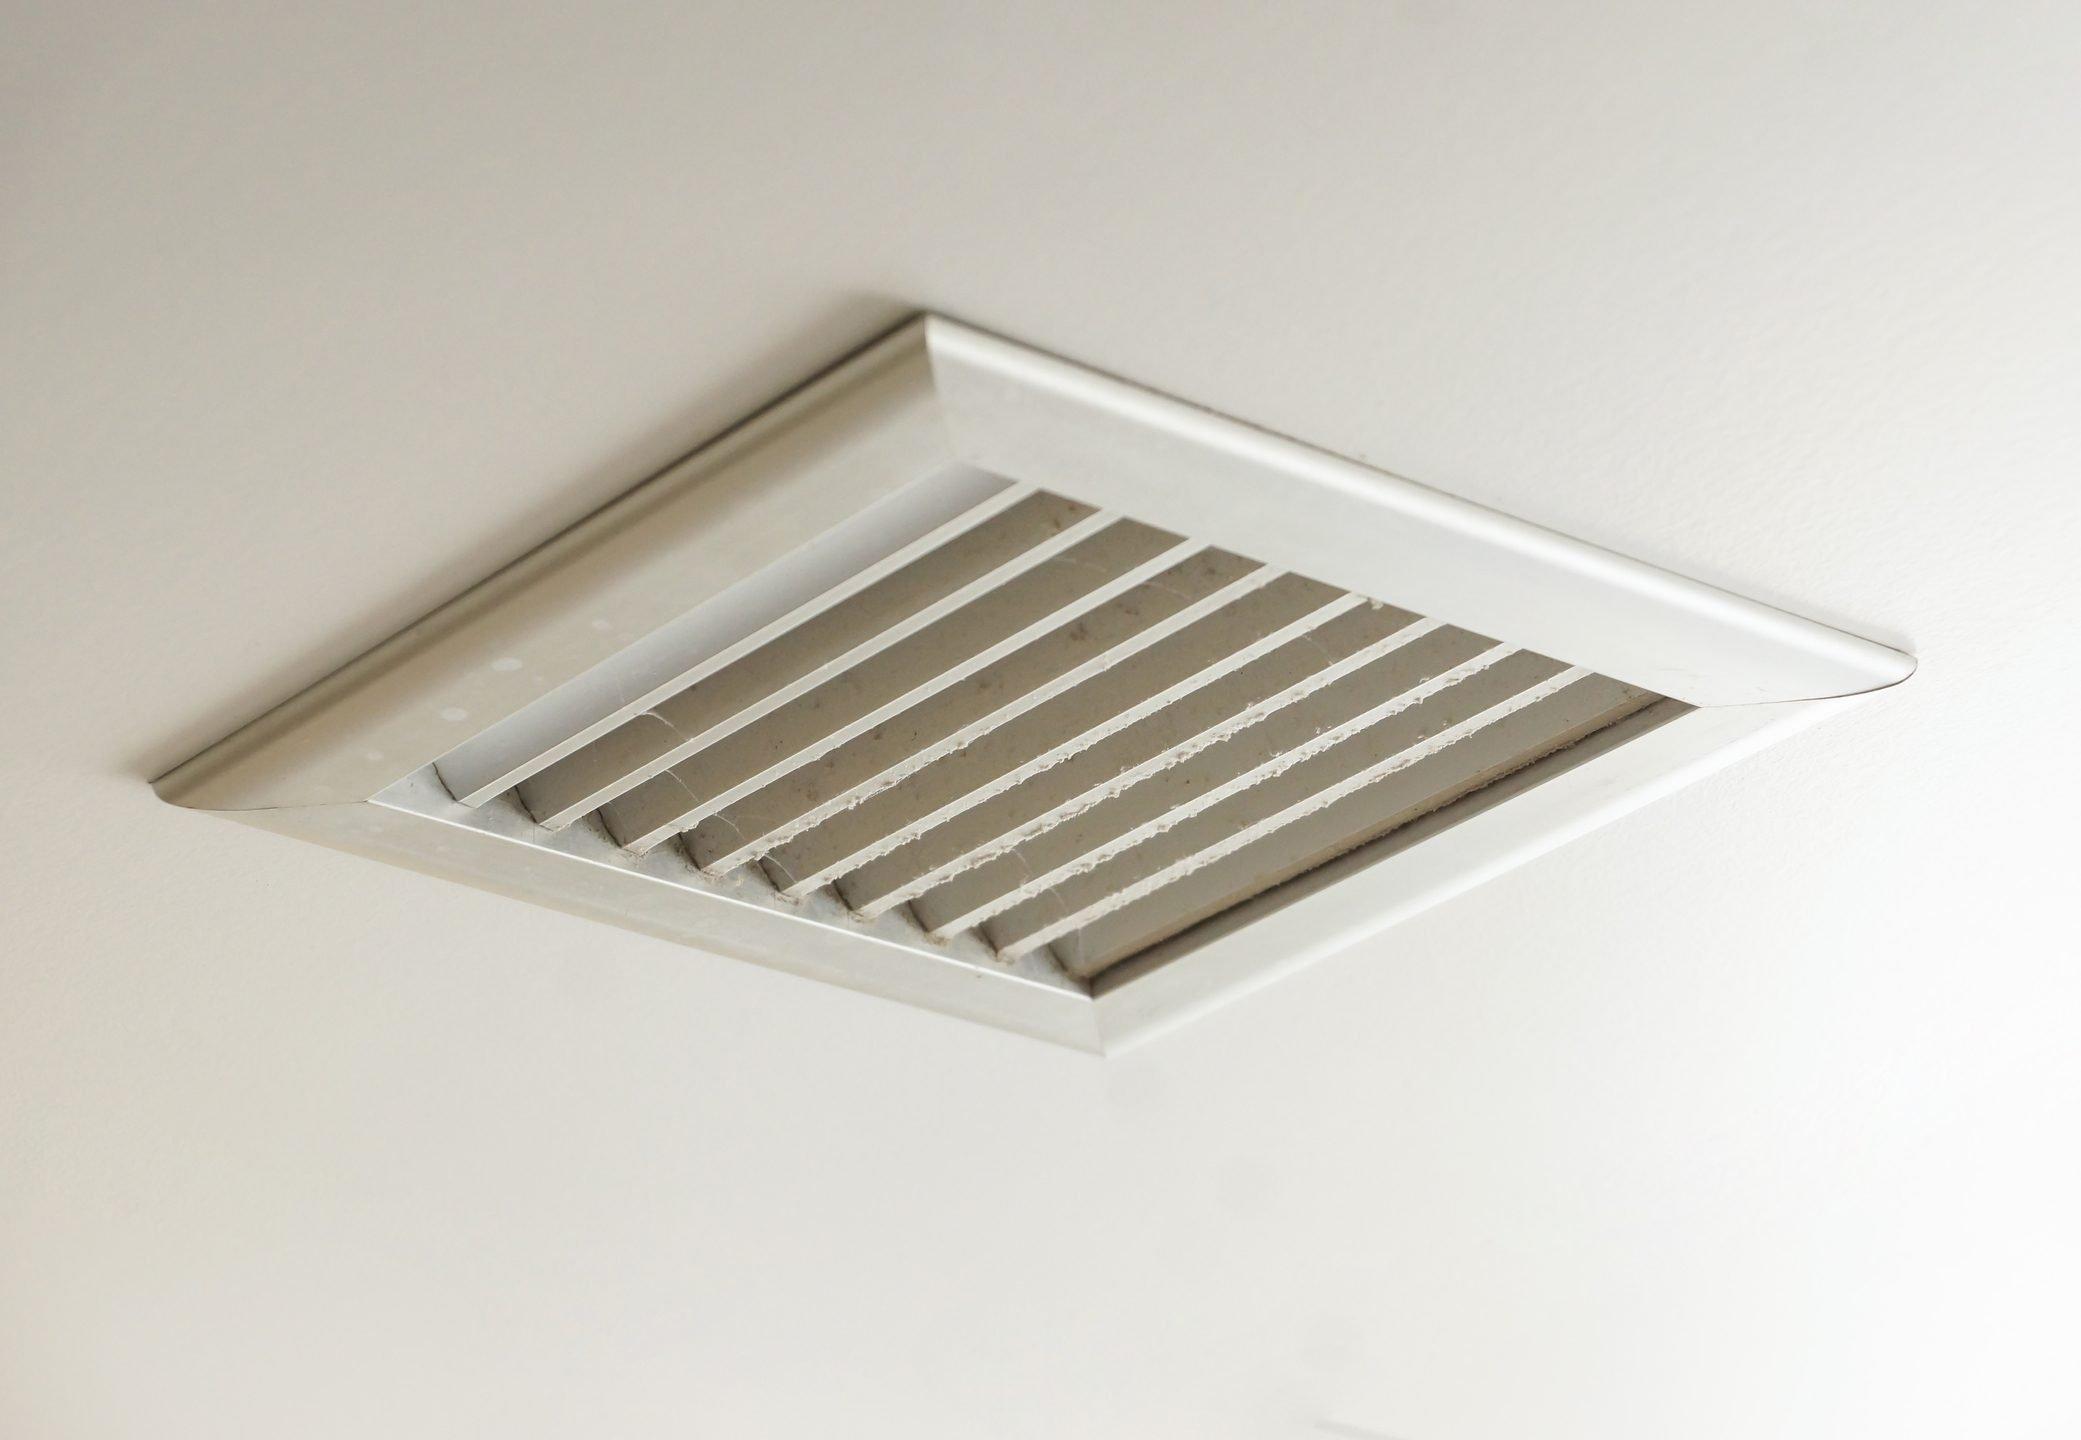 Dirty air ventilator